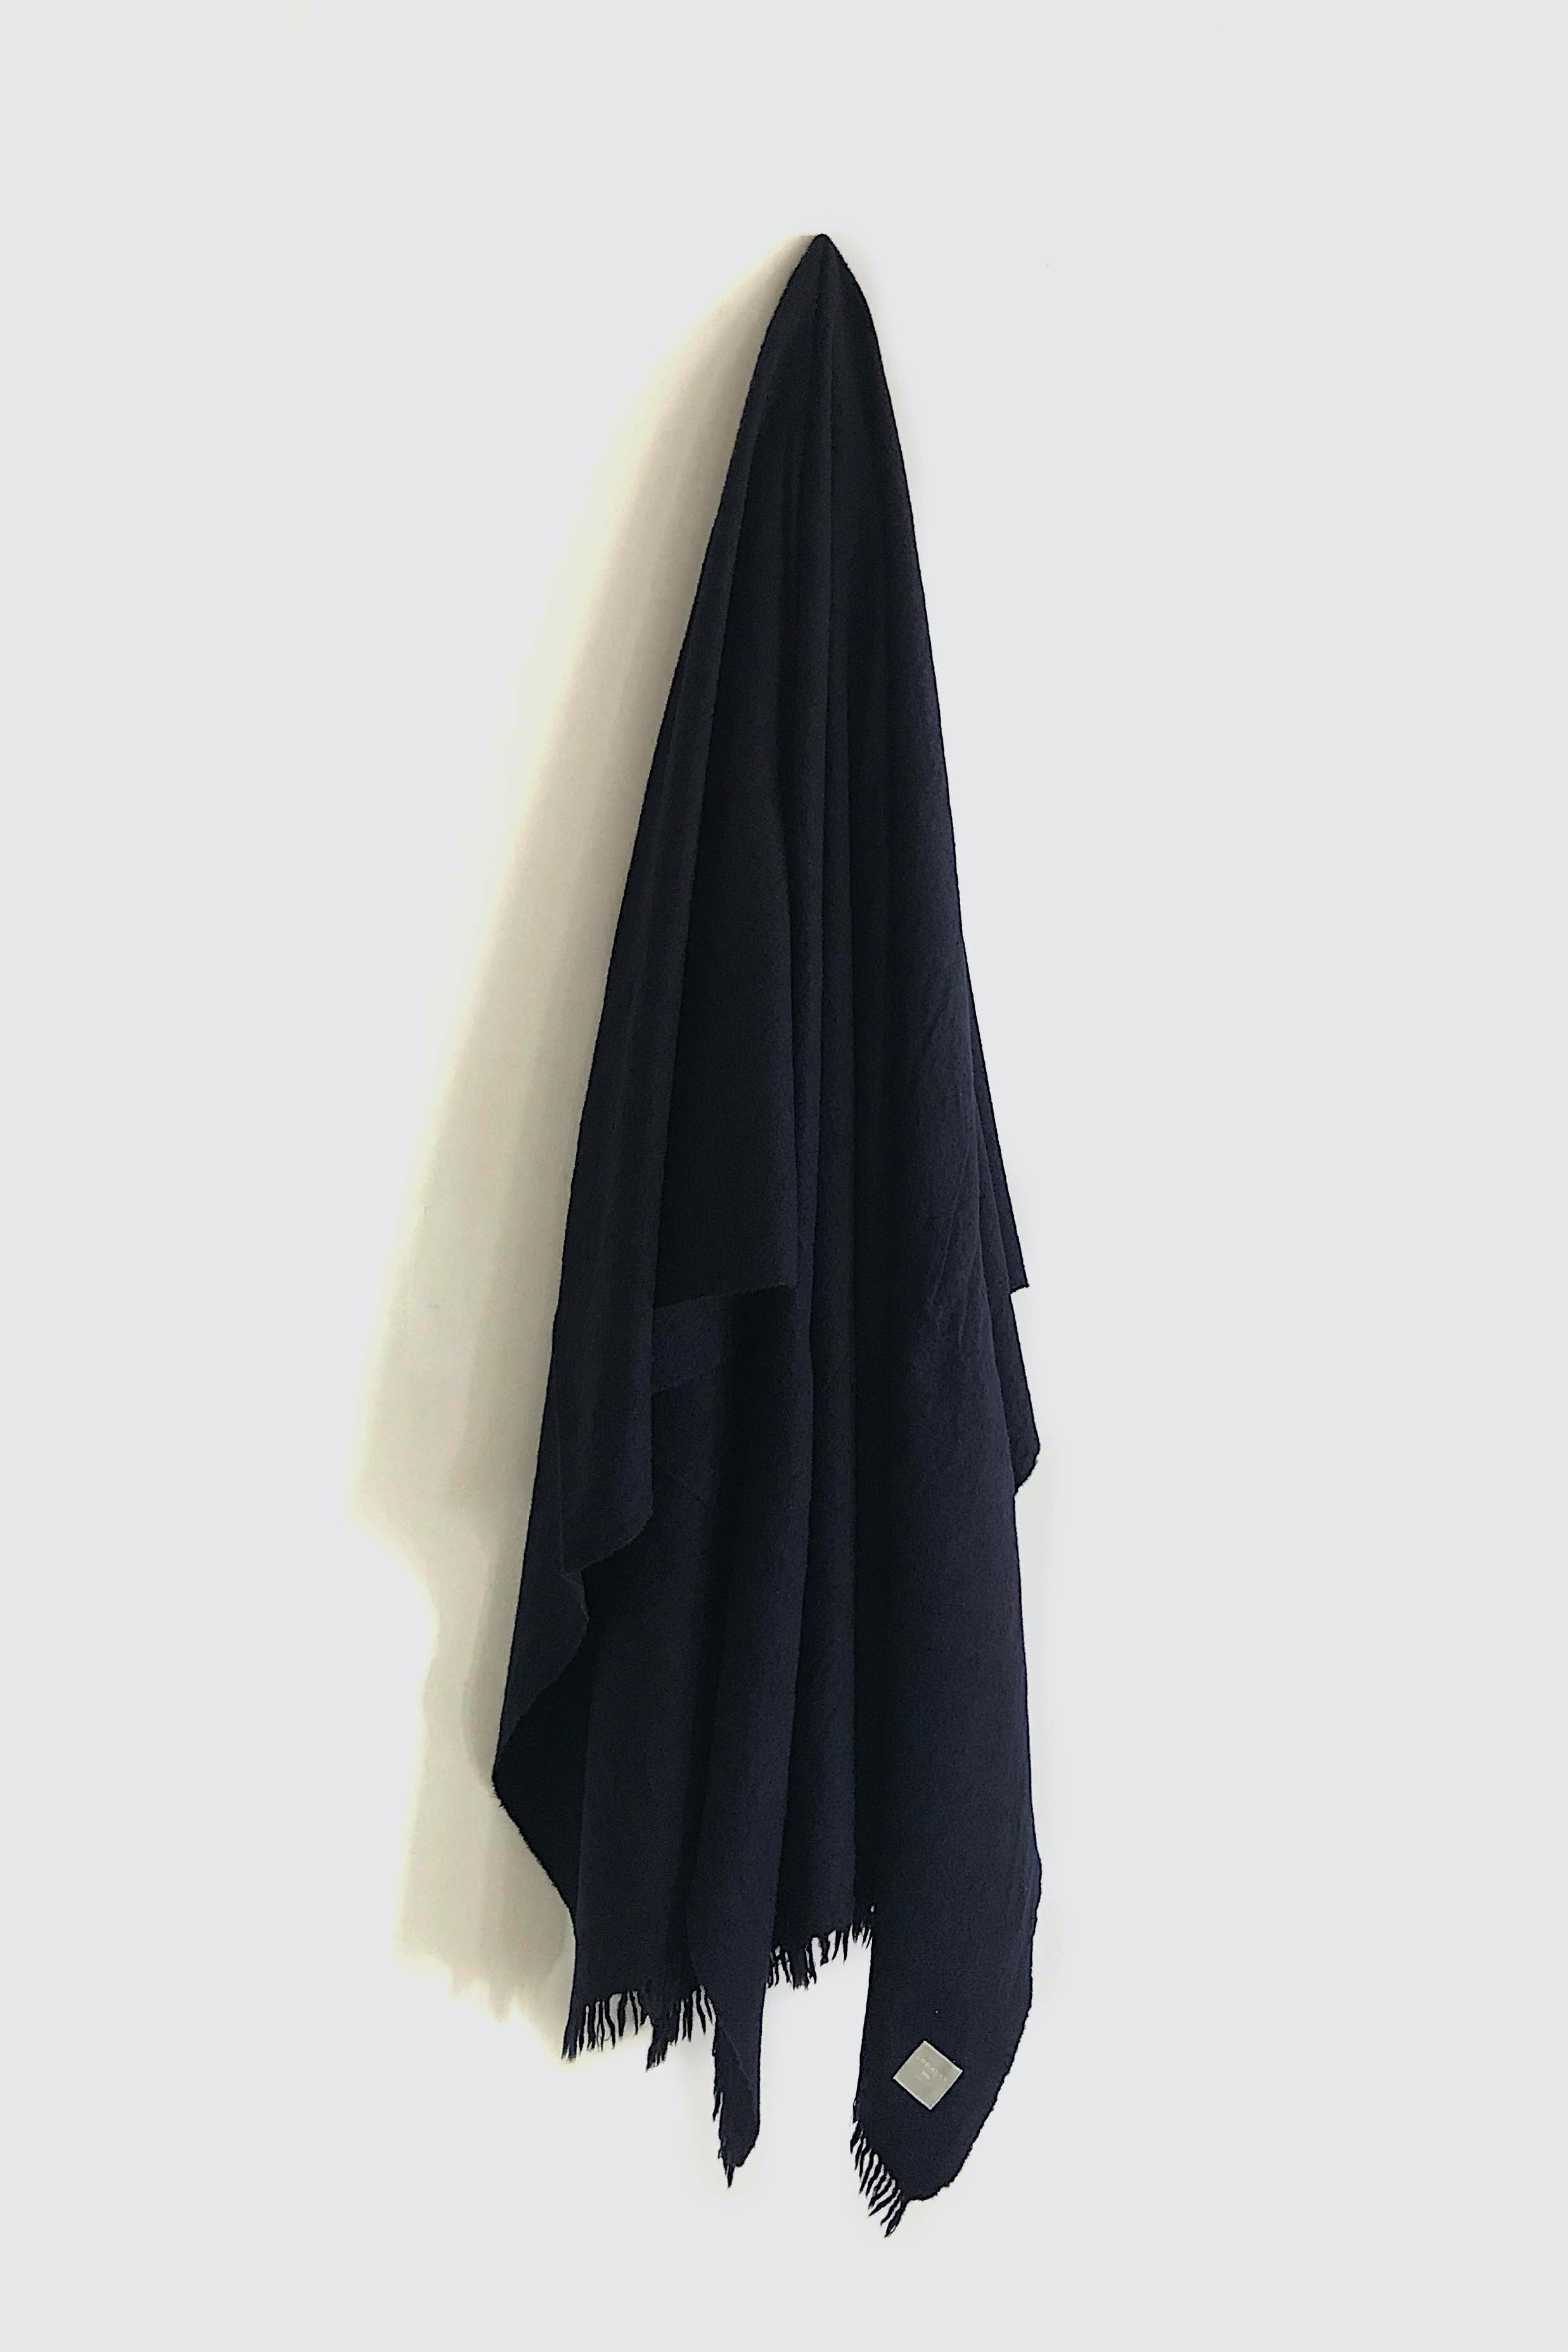 01472-4 muji semicircle cut stole / navy